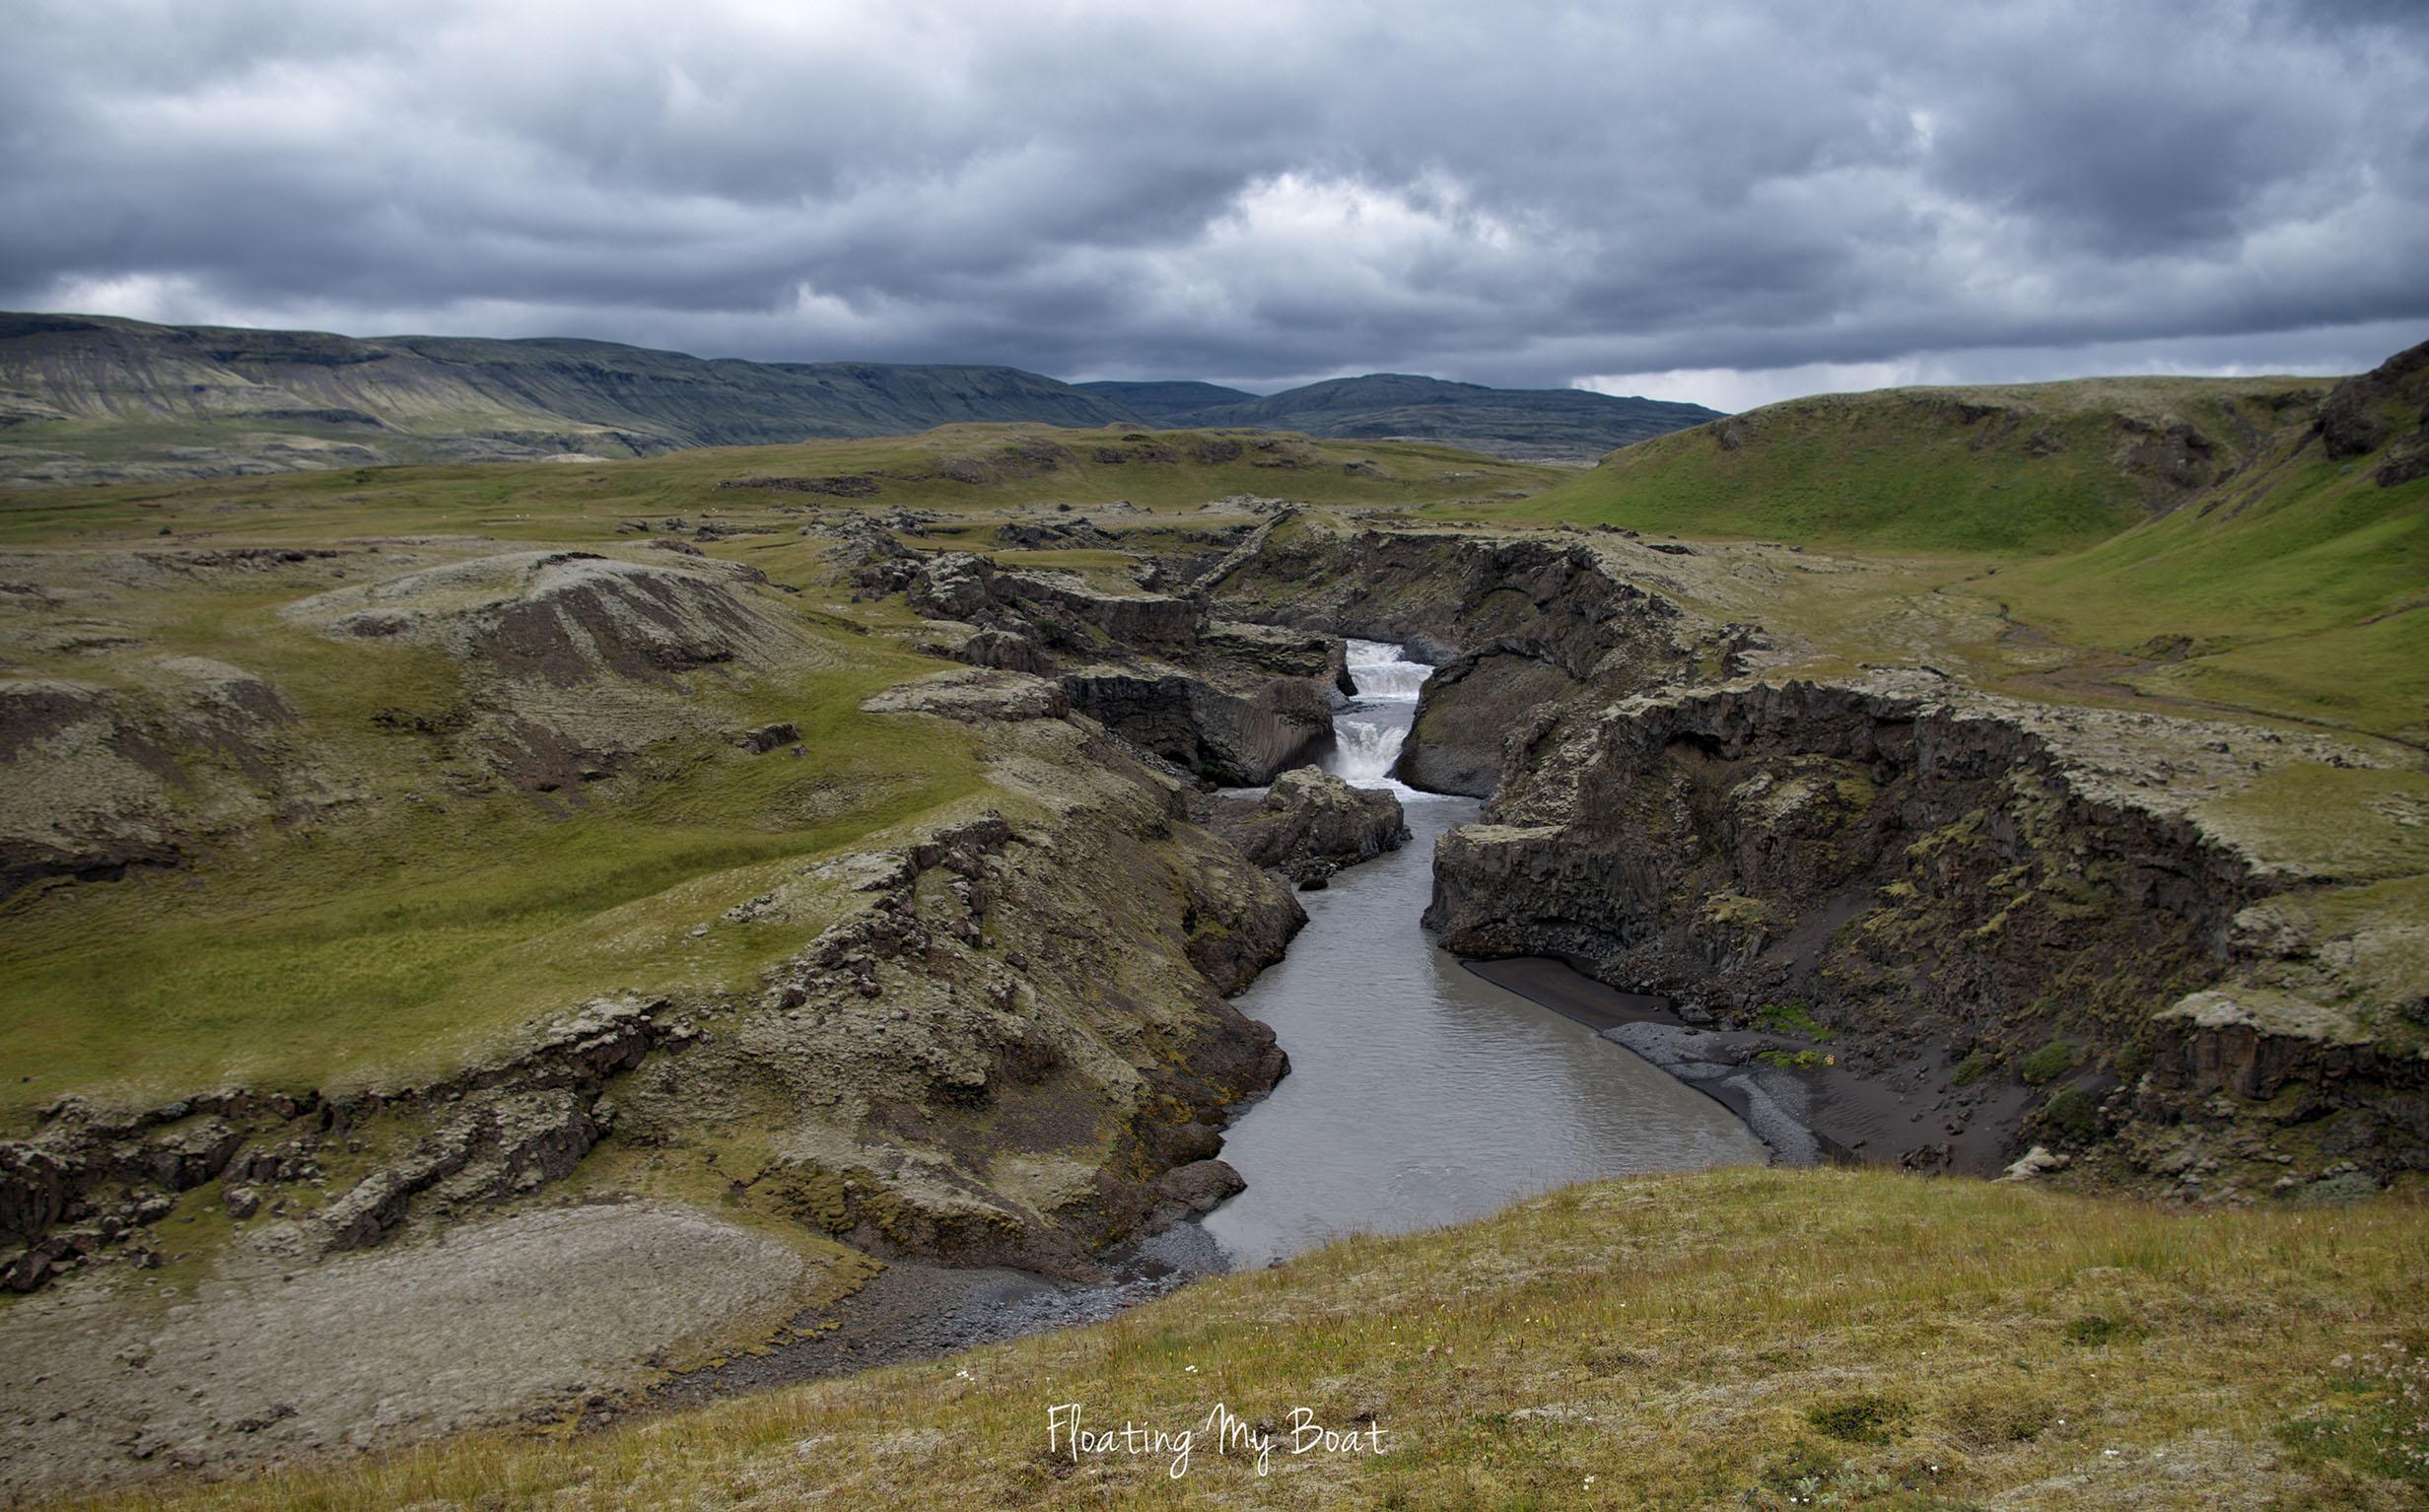 vatnajokull-iceland-trekking-day-one-6